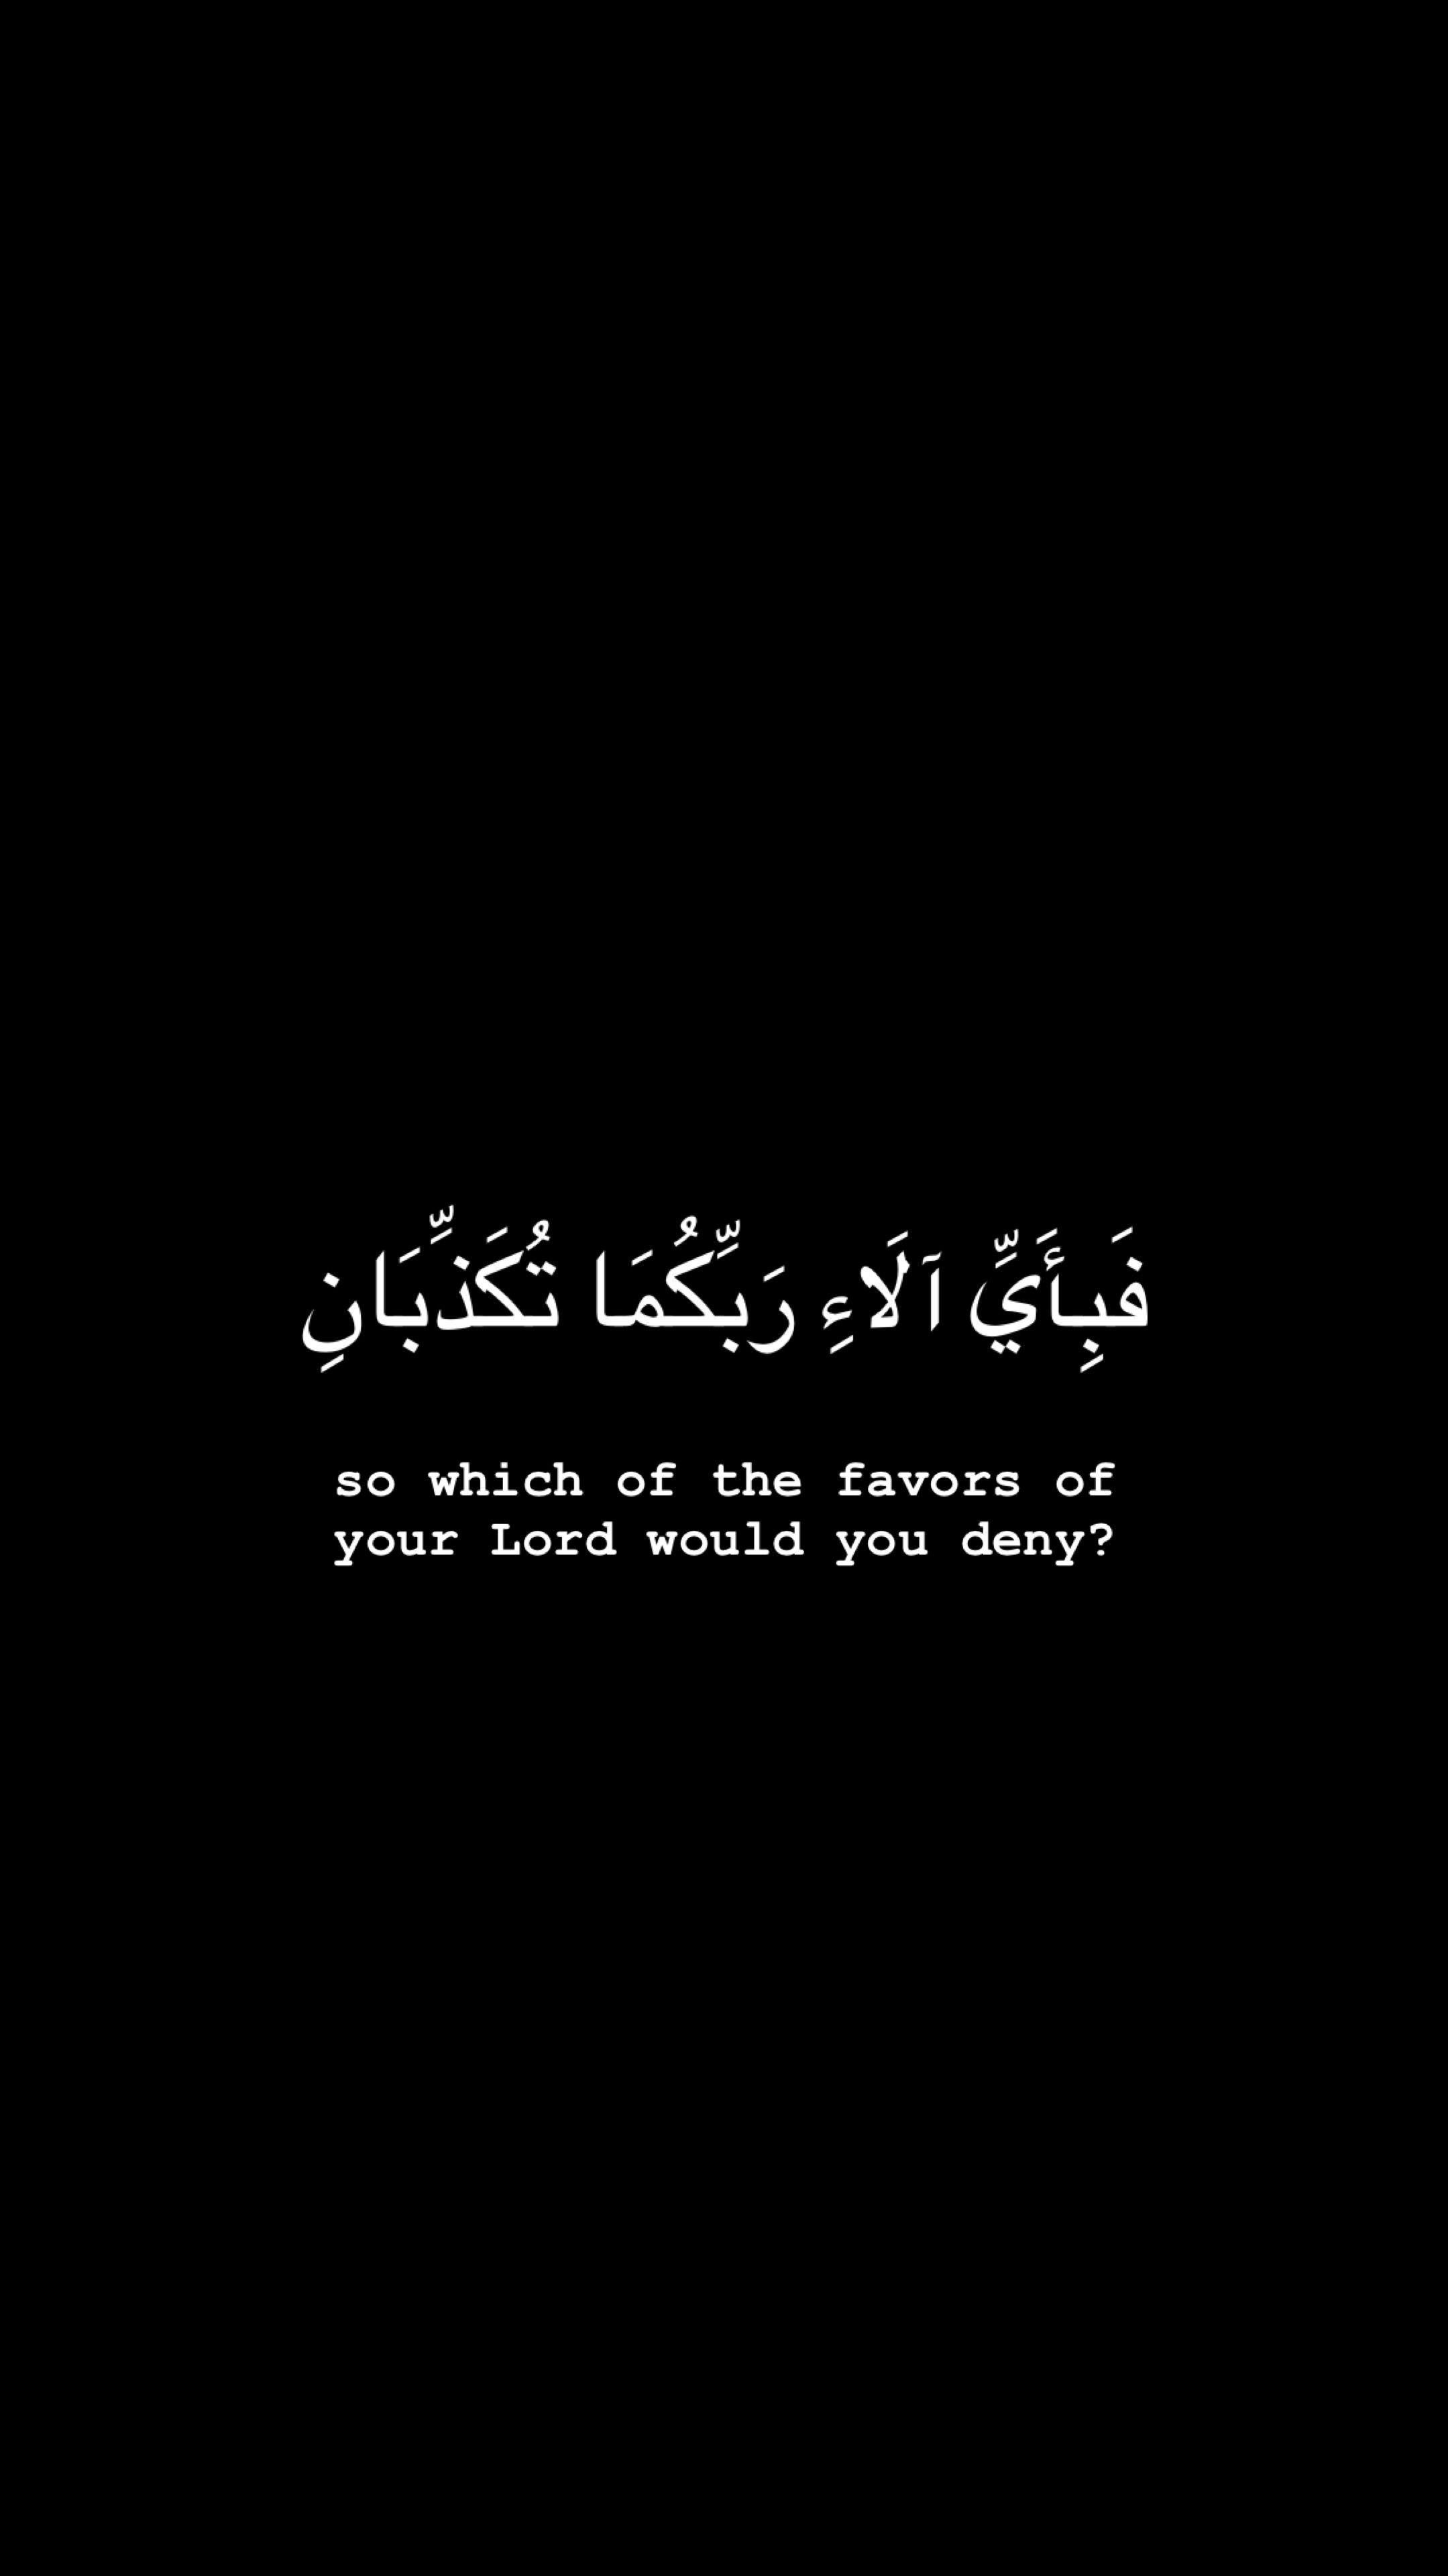 Islam Moslem Quote Beautiful Lockscreen Kata Kata Motivasi Kutipan Pelajaran Hidup Kutipan Motivasi